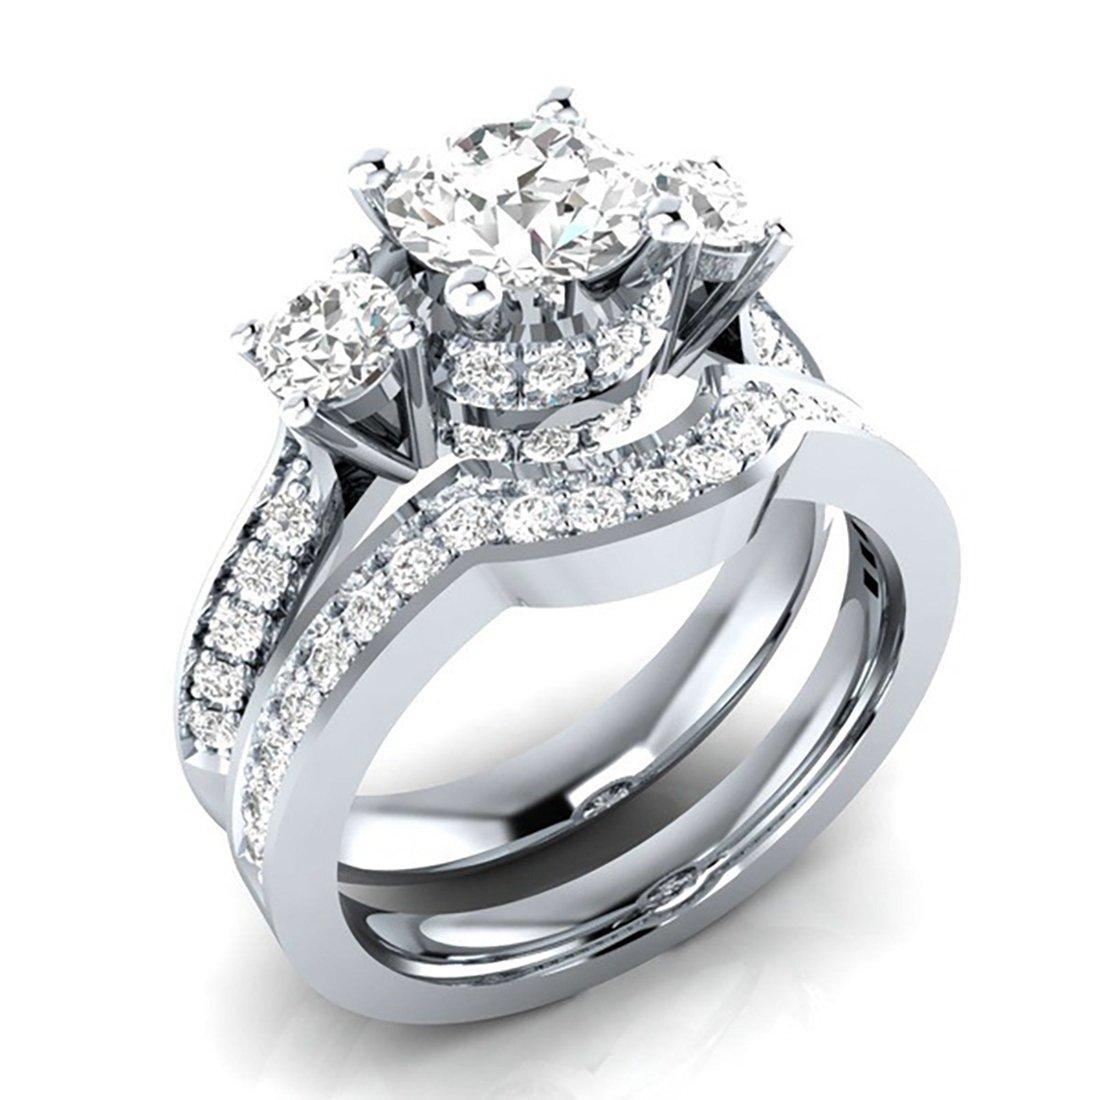 DALARAN Fashion Cubic Zirconia Rings Wedding Engagement Ring Set Size 10 White Gold Plated